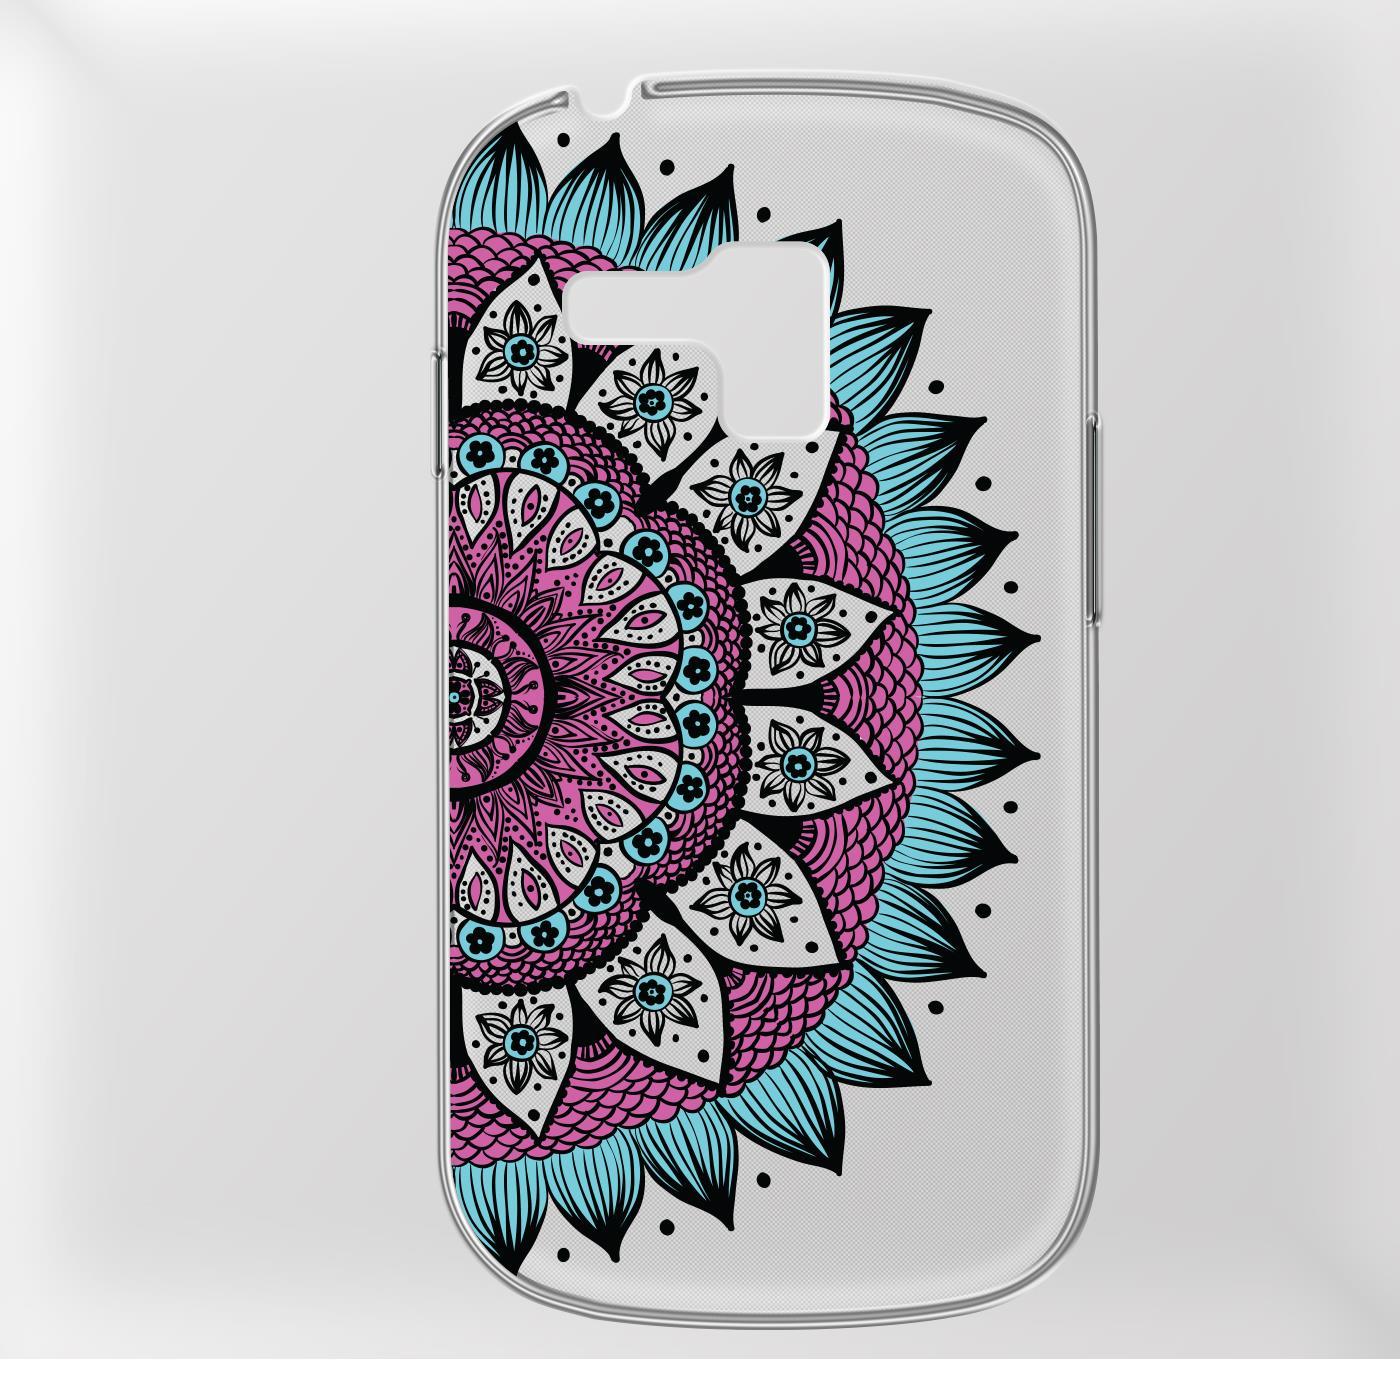 motiv handy schutz h lle samsung galaxy s3 mini case cover. Black Bedroom Furniture Sets. Home Design Ideas